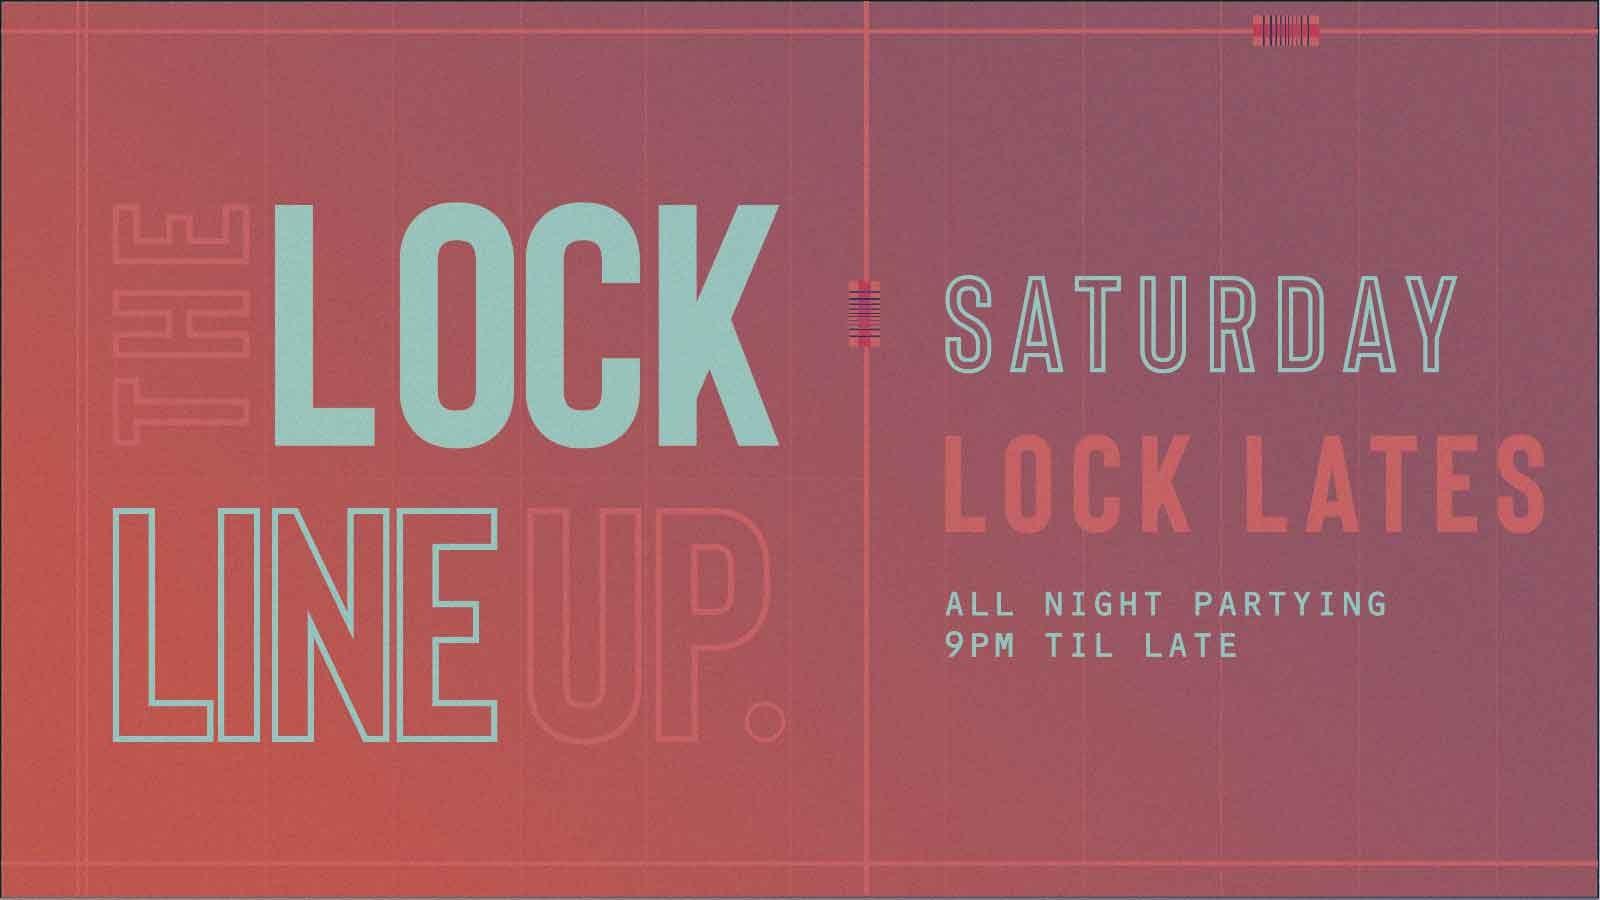 Lock Lates – Every Saturday